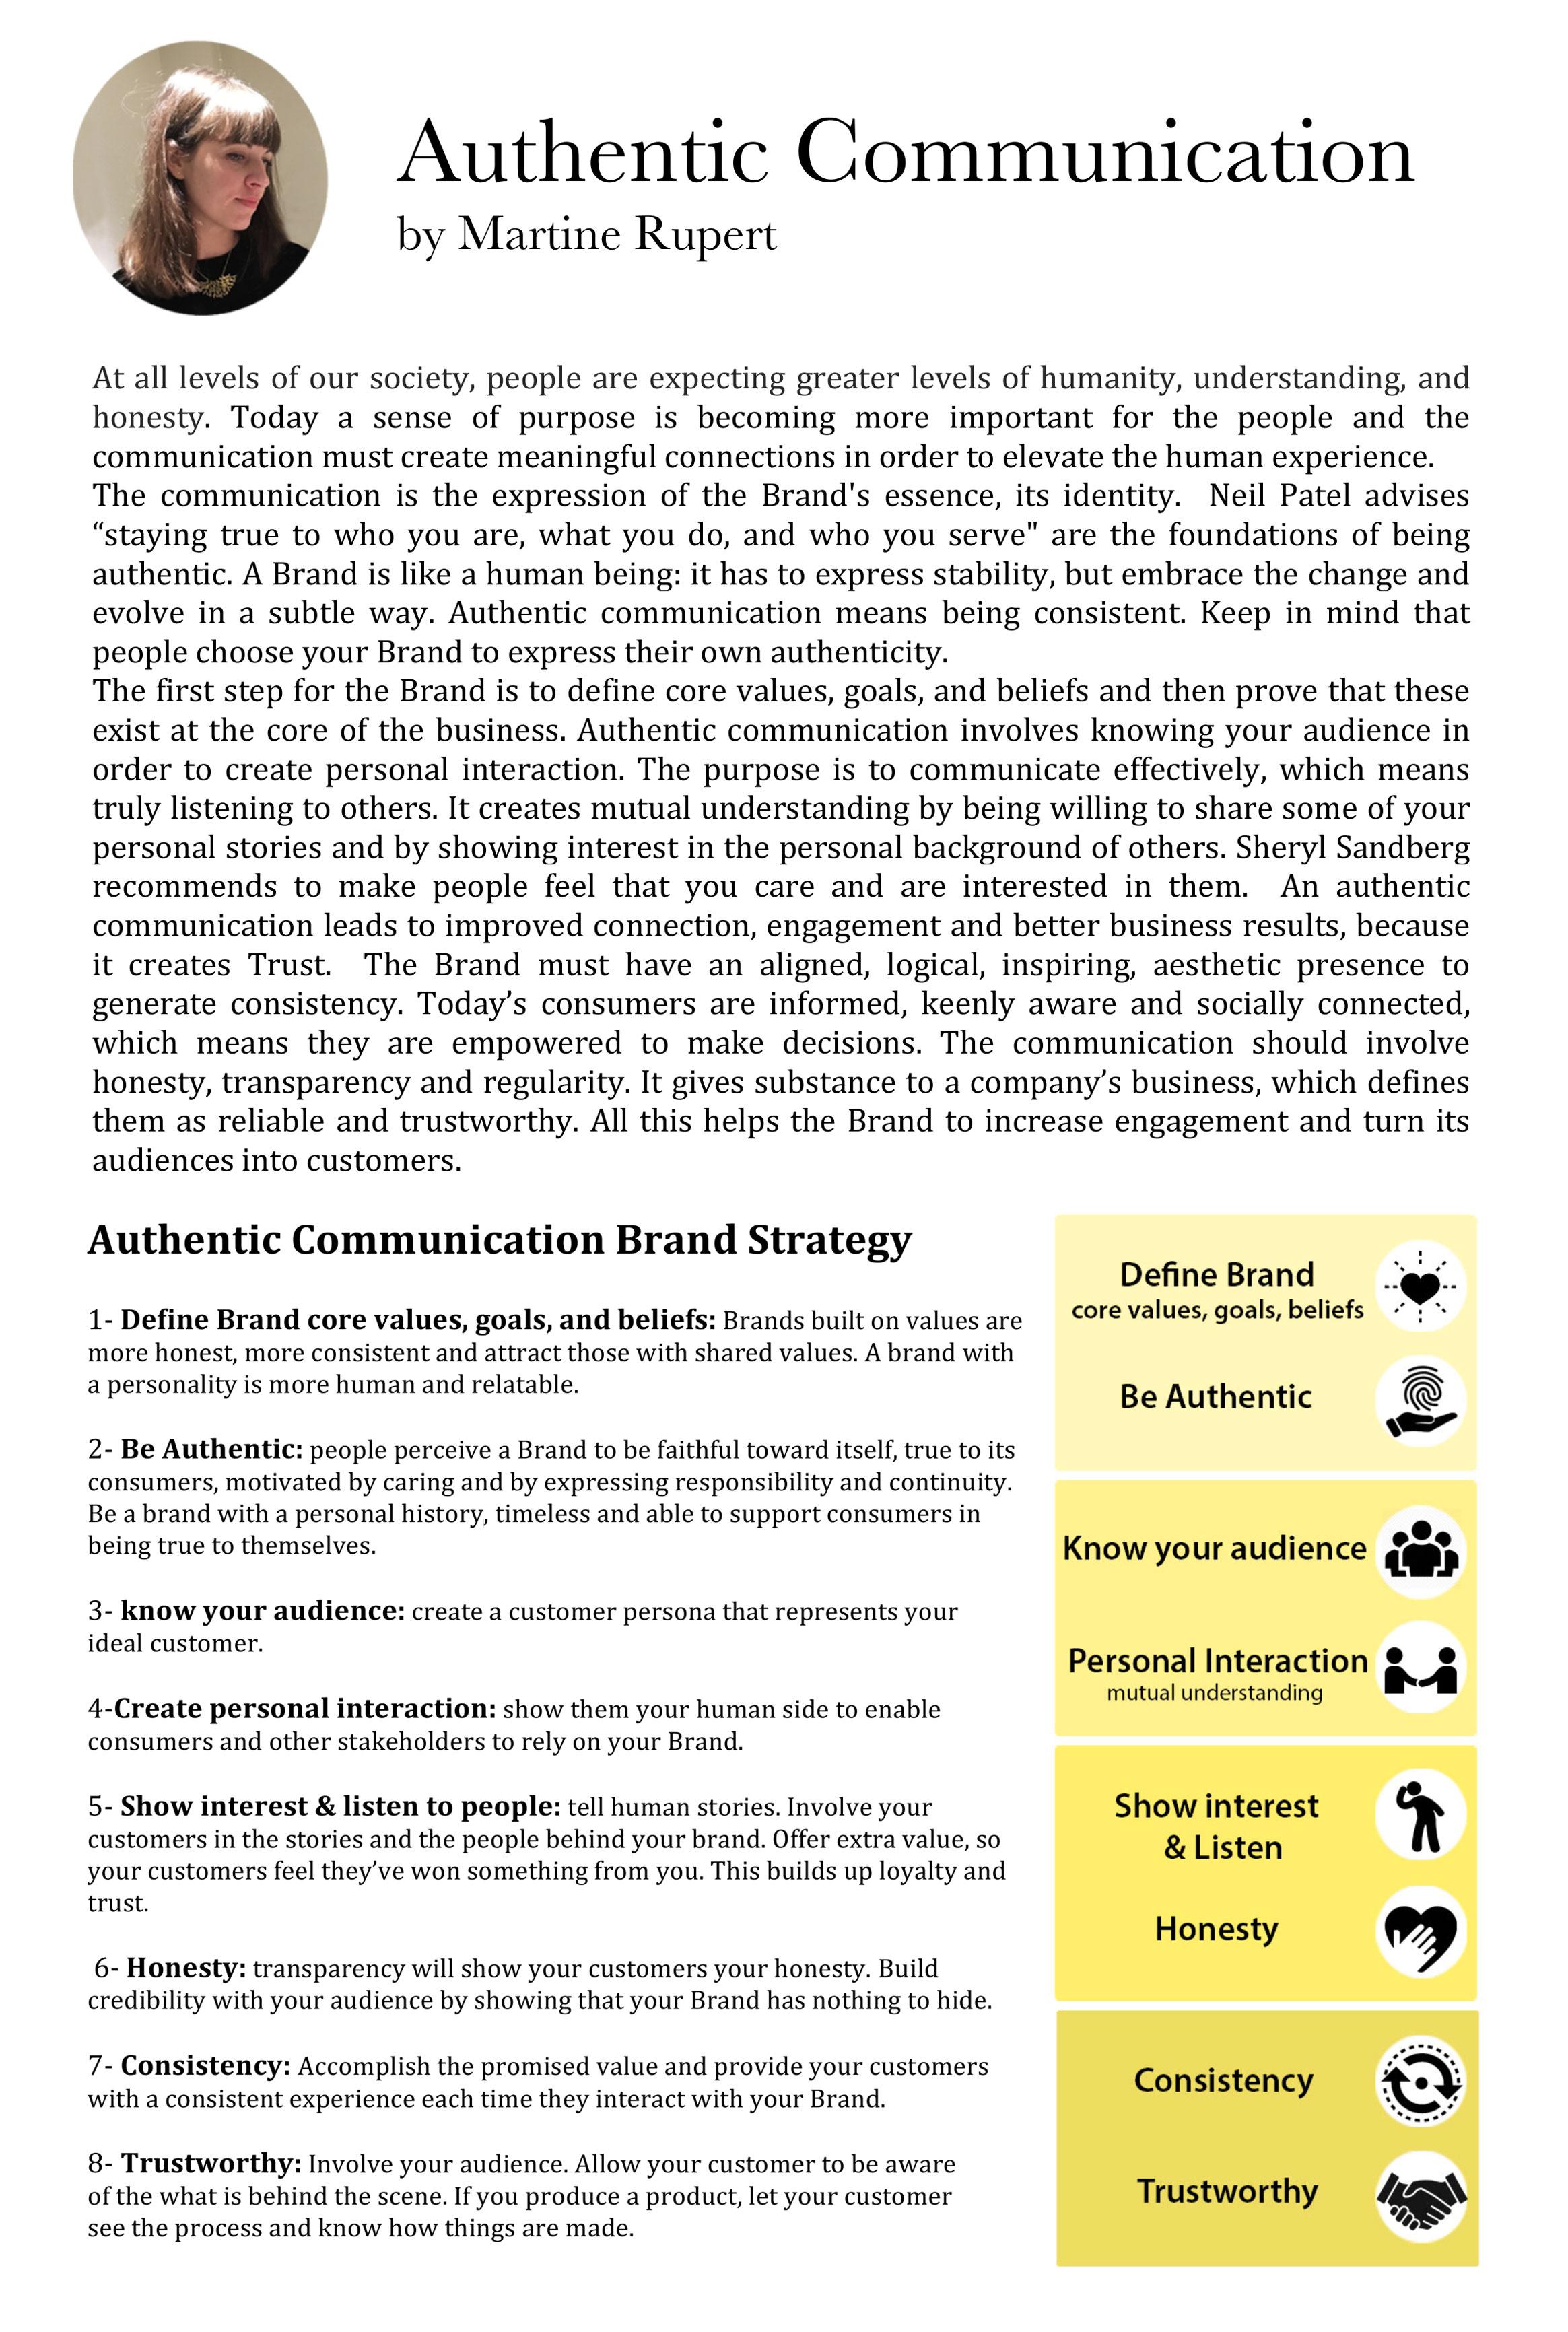 MRupert-Authentic-Communication